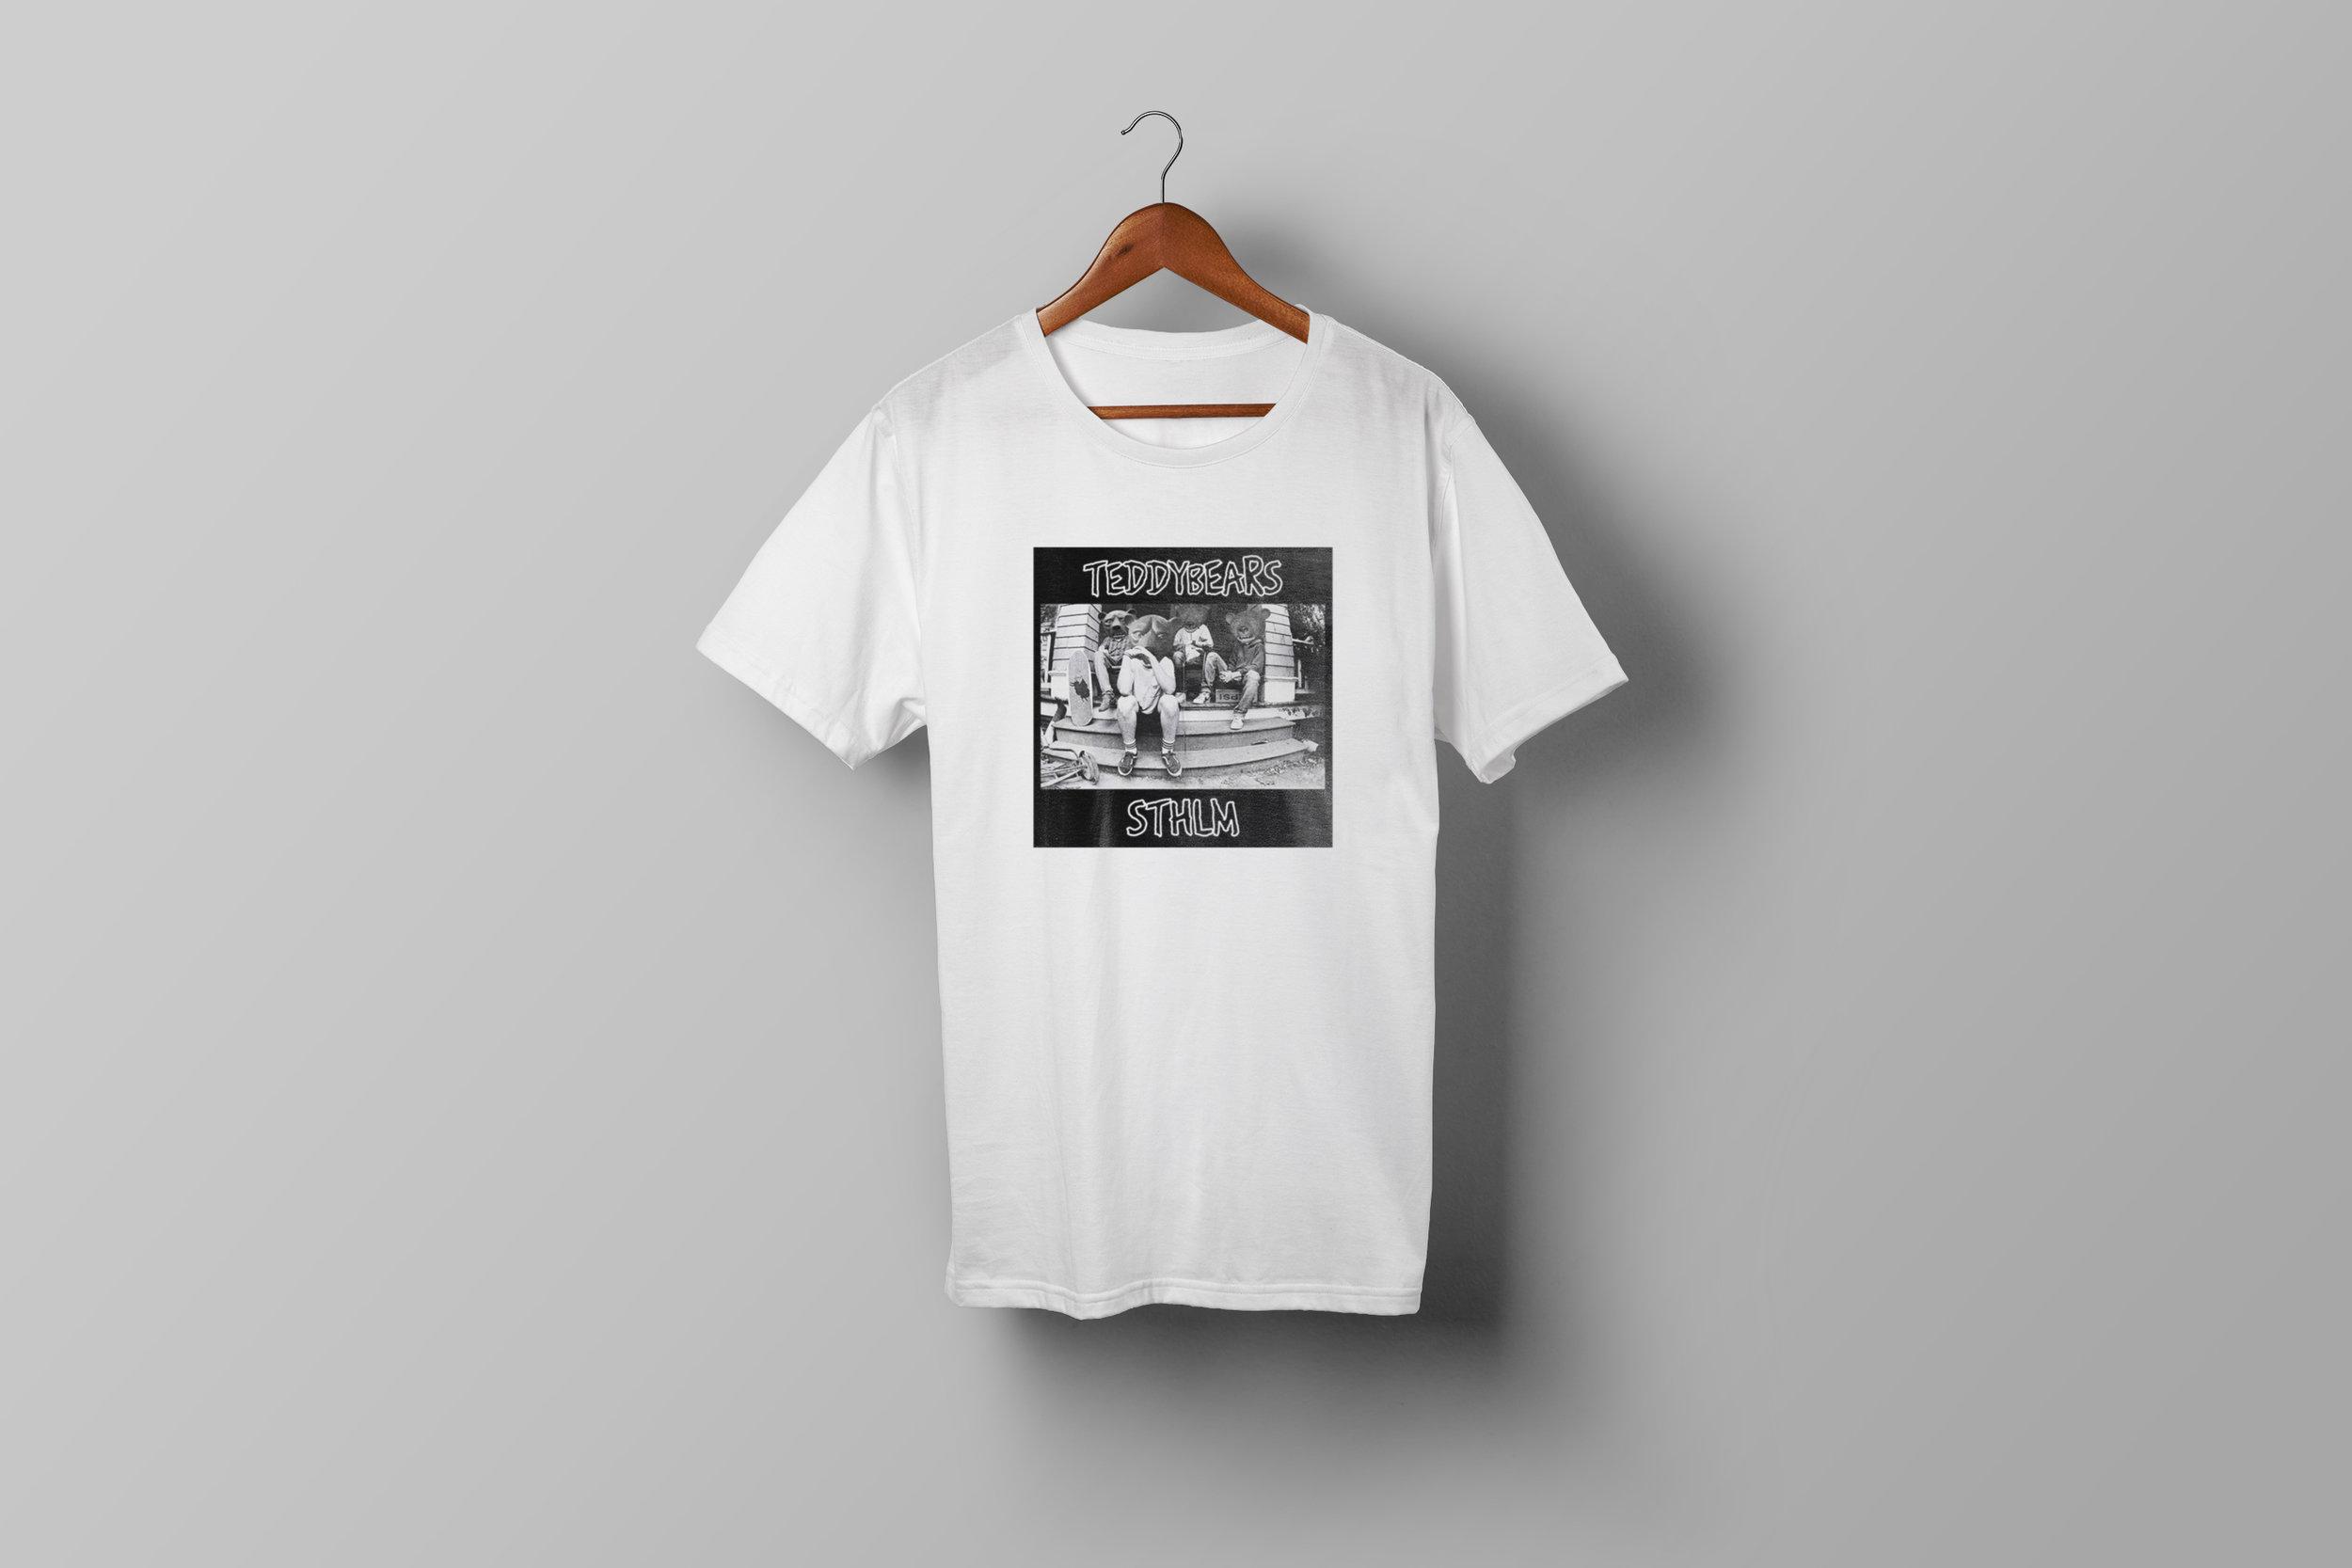 teddybears-sthlm-tshirt